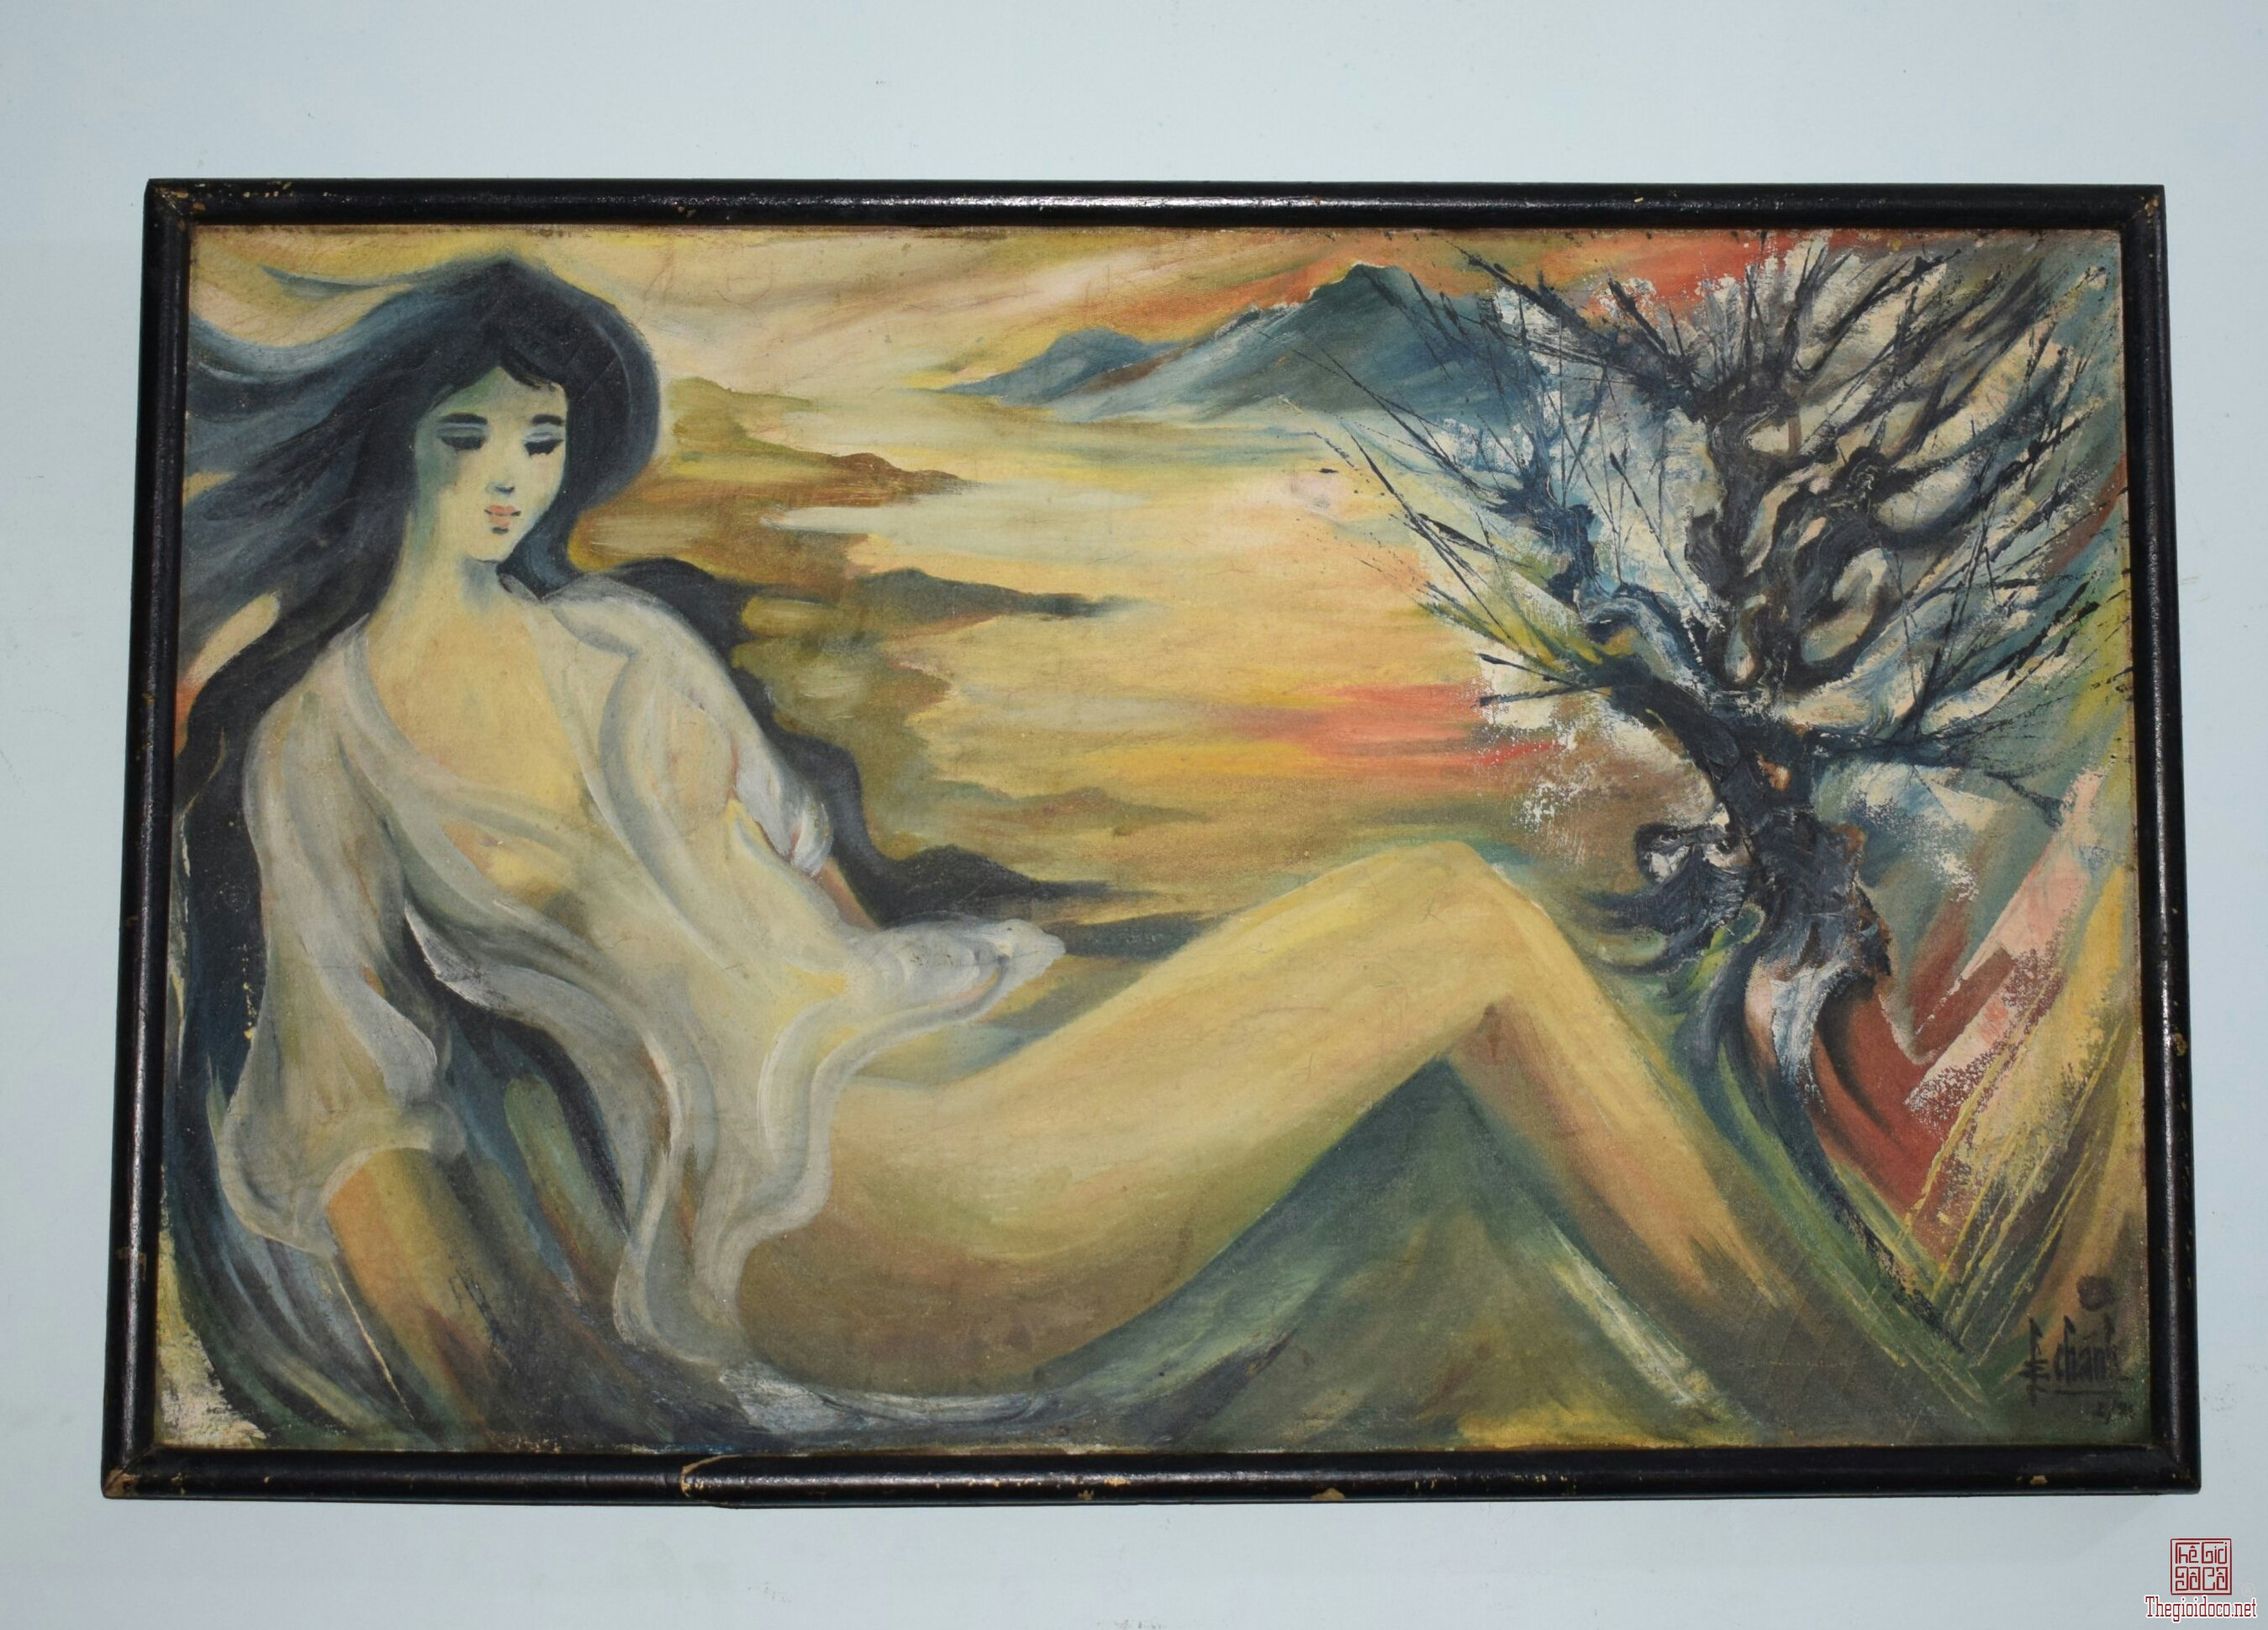 tranh sơn dầu họa sĩ Lê Chánh